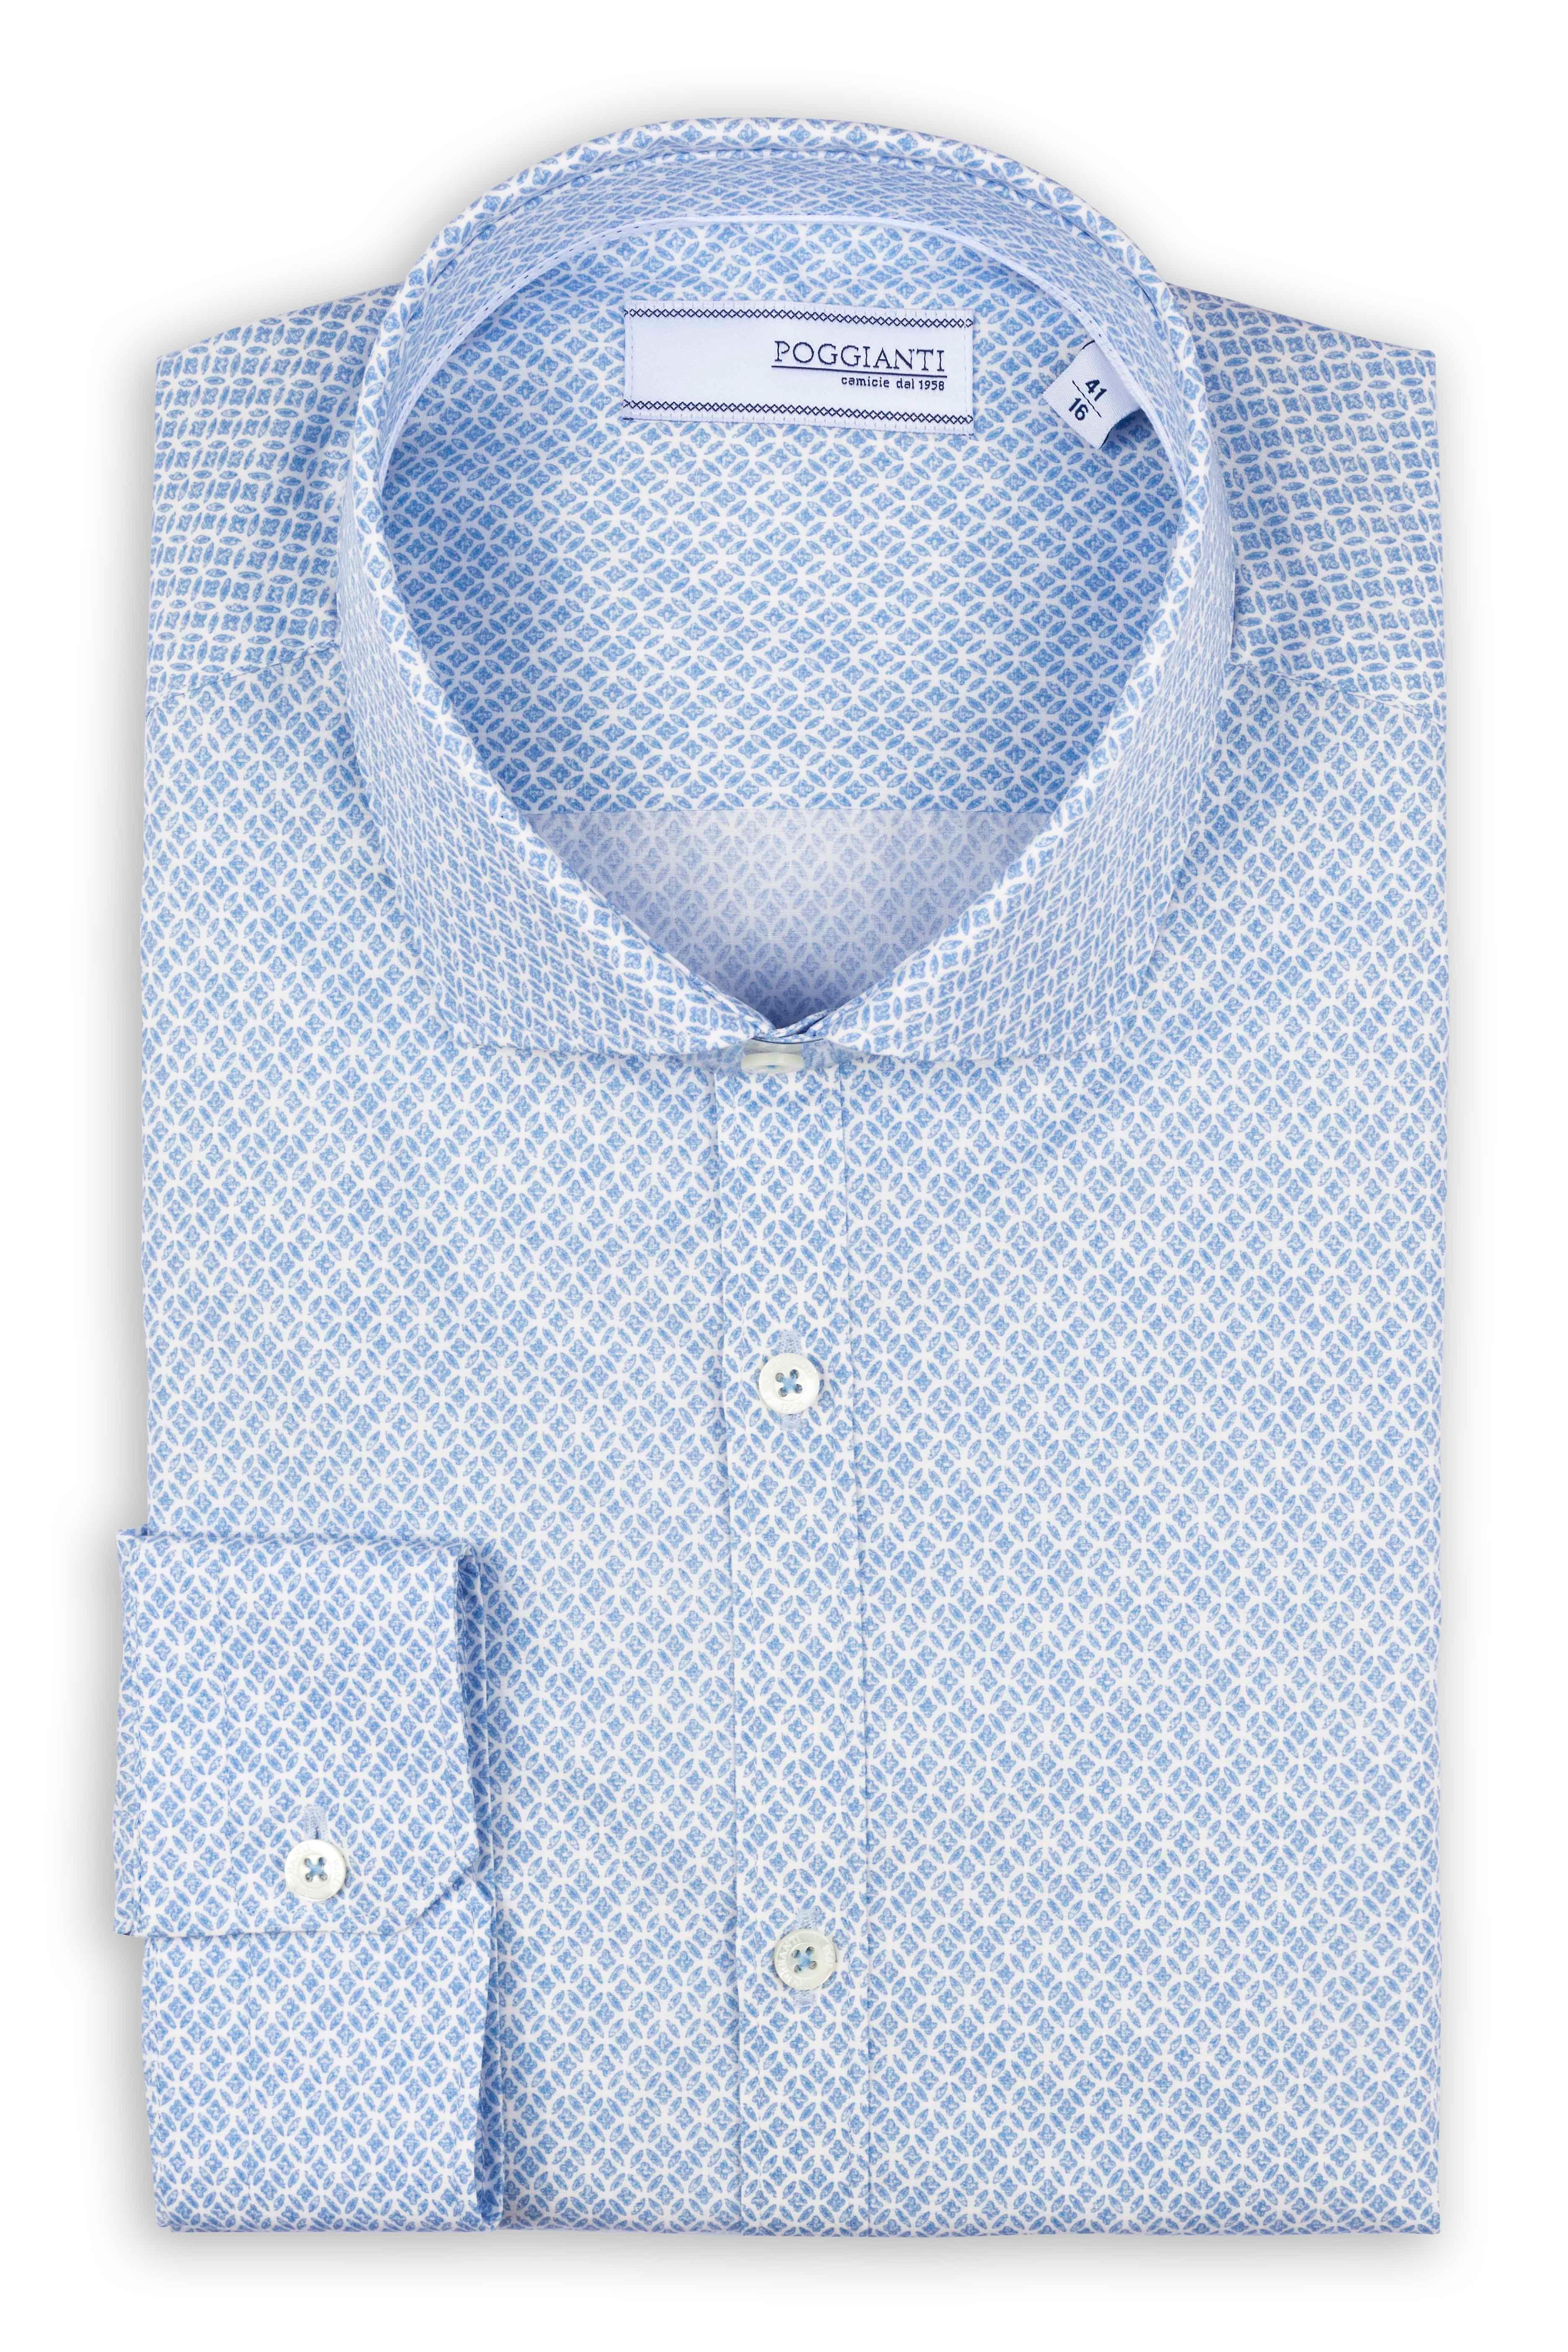 Fabio Giovanni Le Torri Shirt - Mens Italian Casual Stylish Shirt 100% Cotton - Long Sleeve